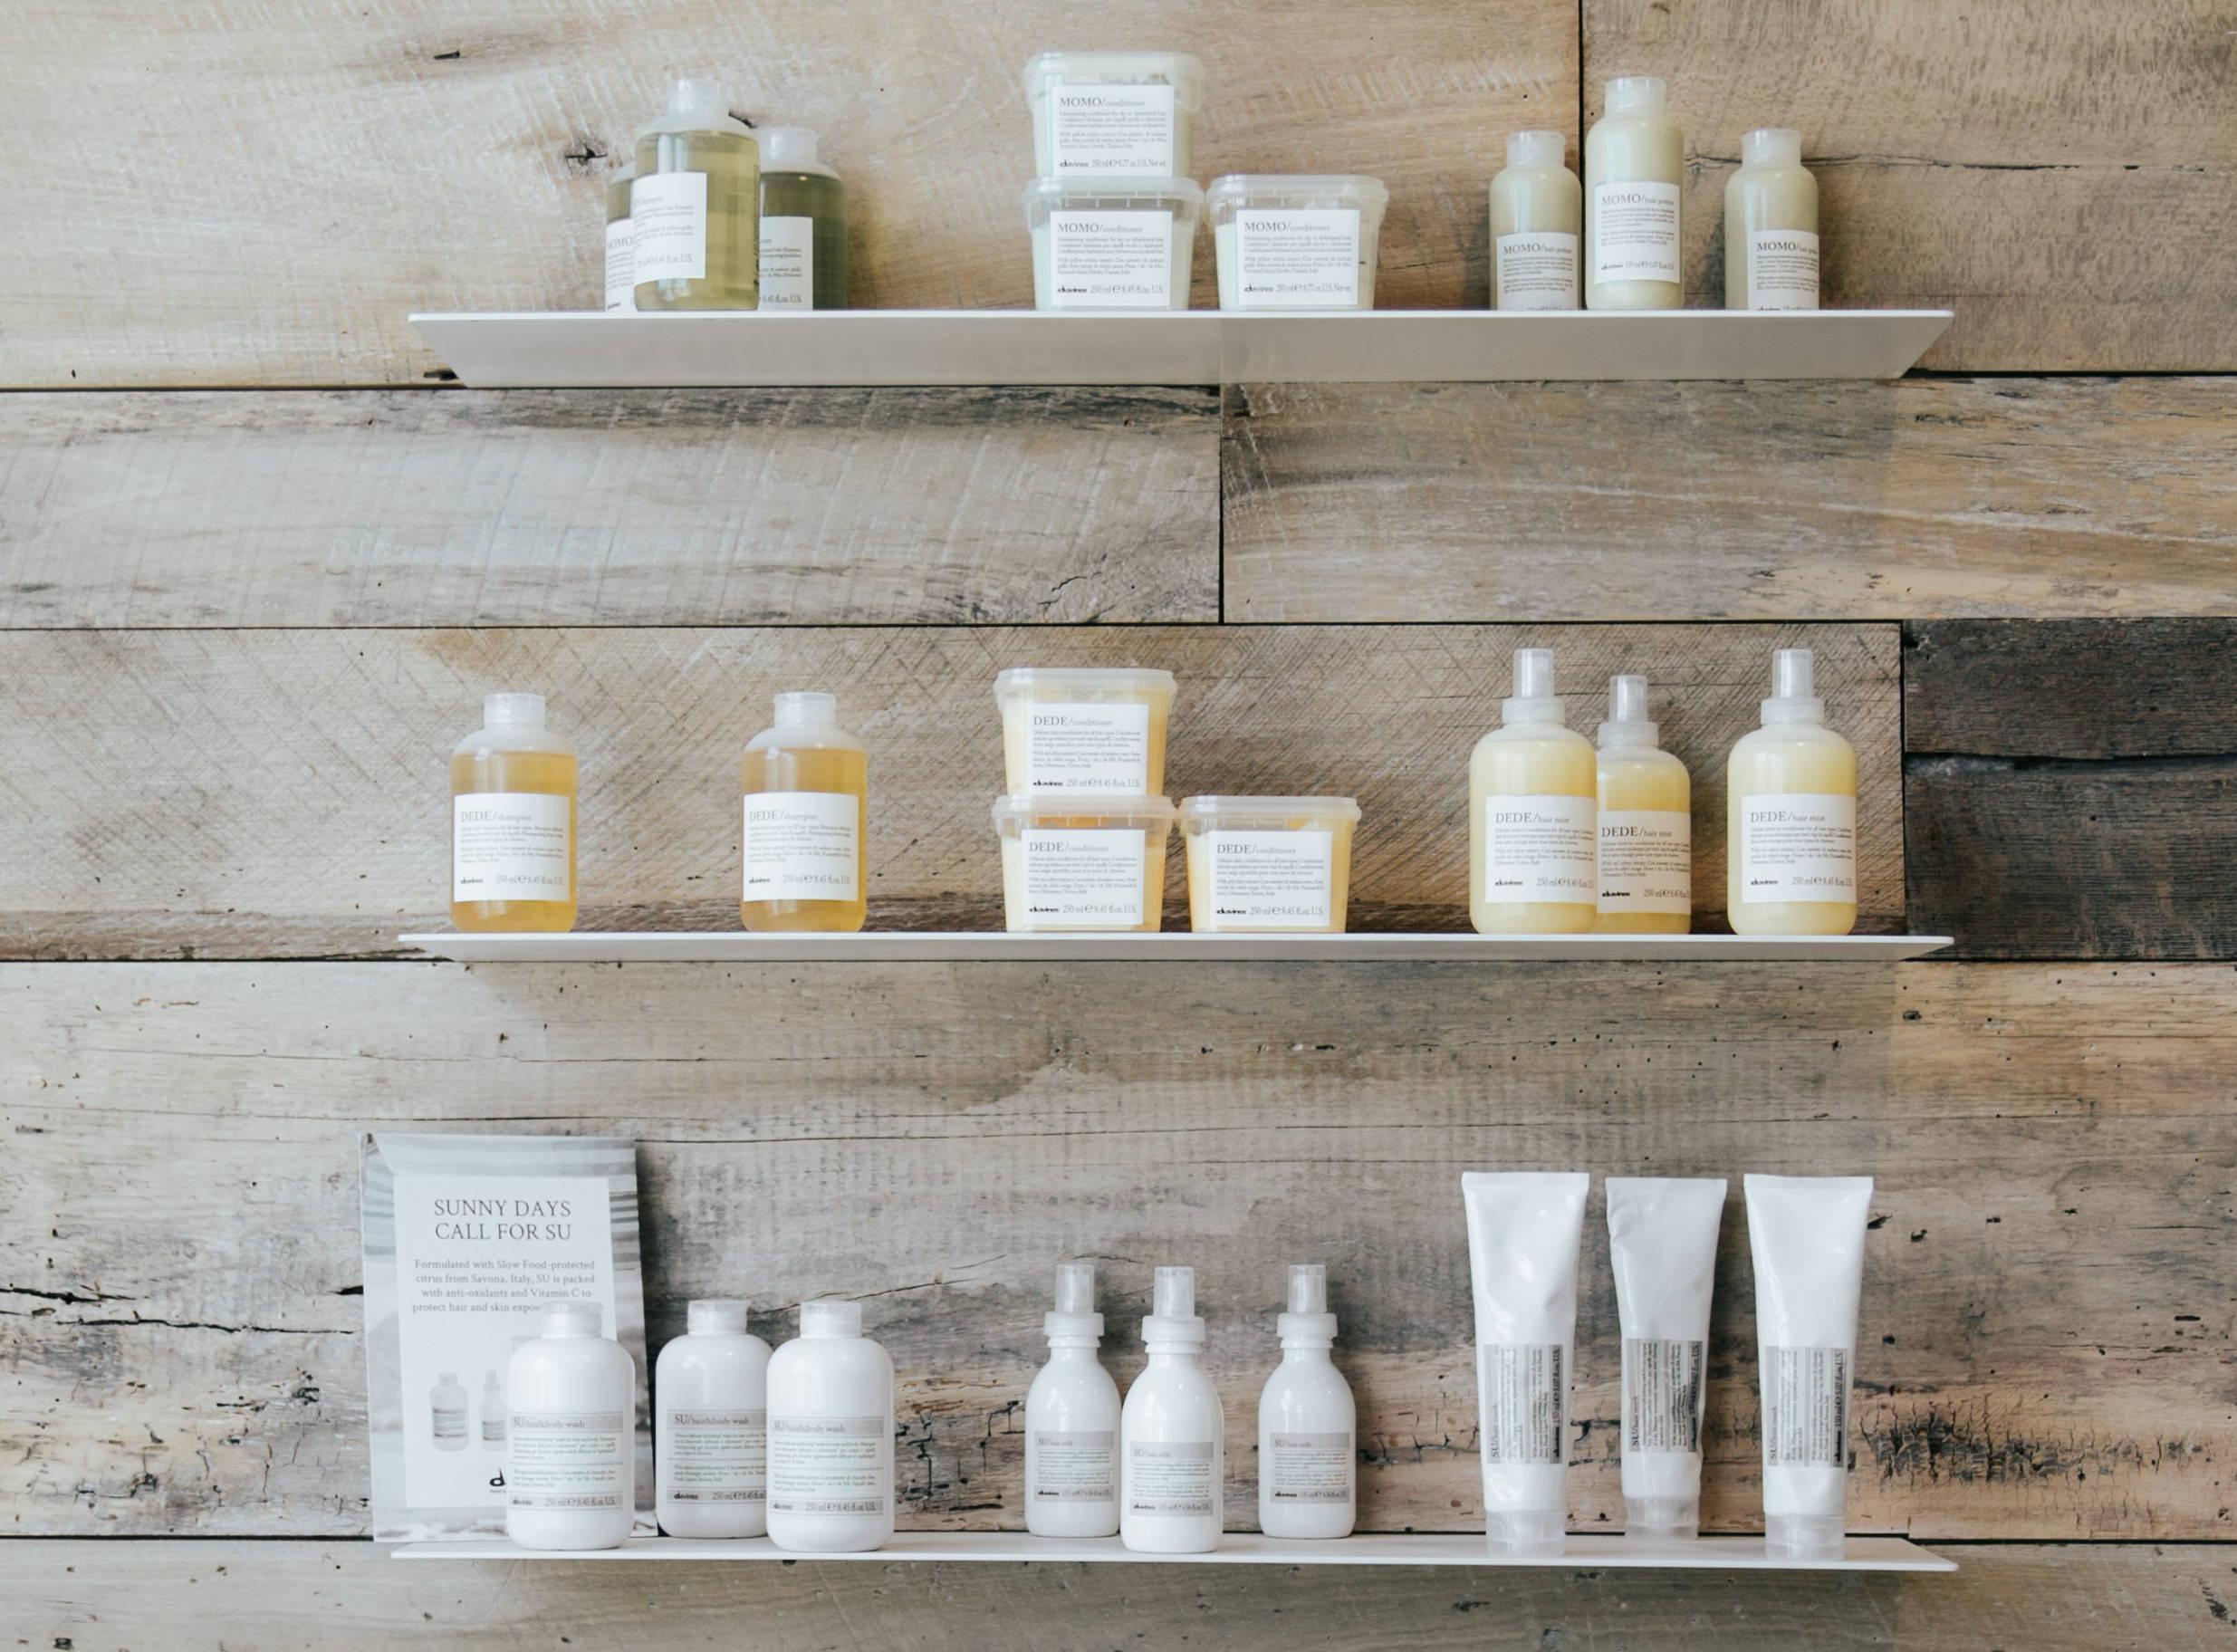 Davines moisturizing hair products